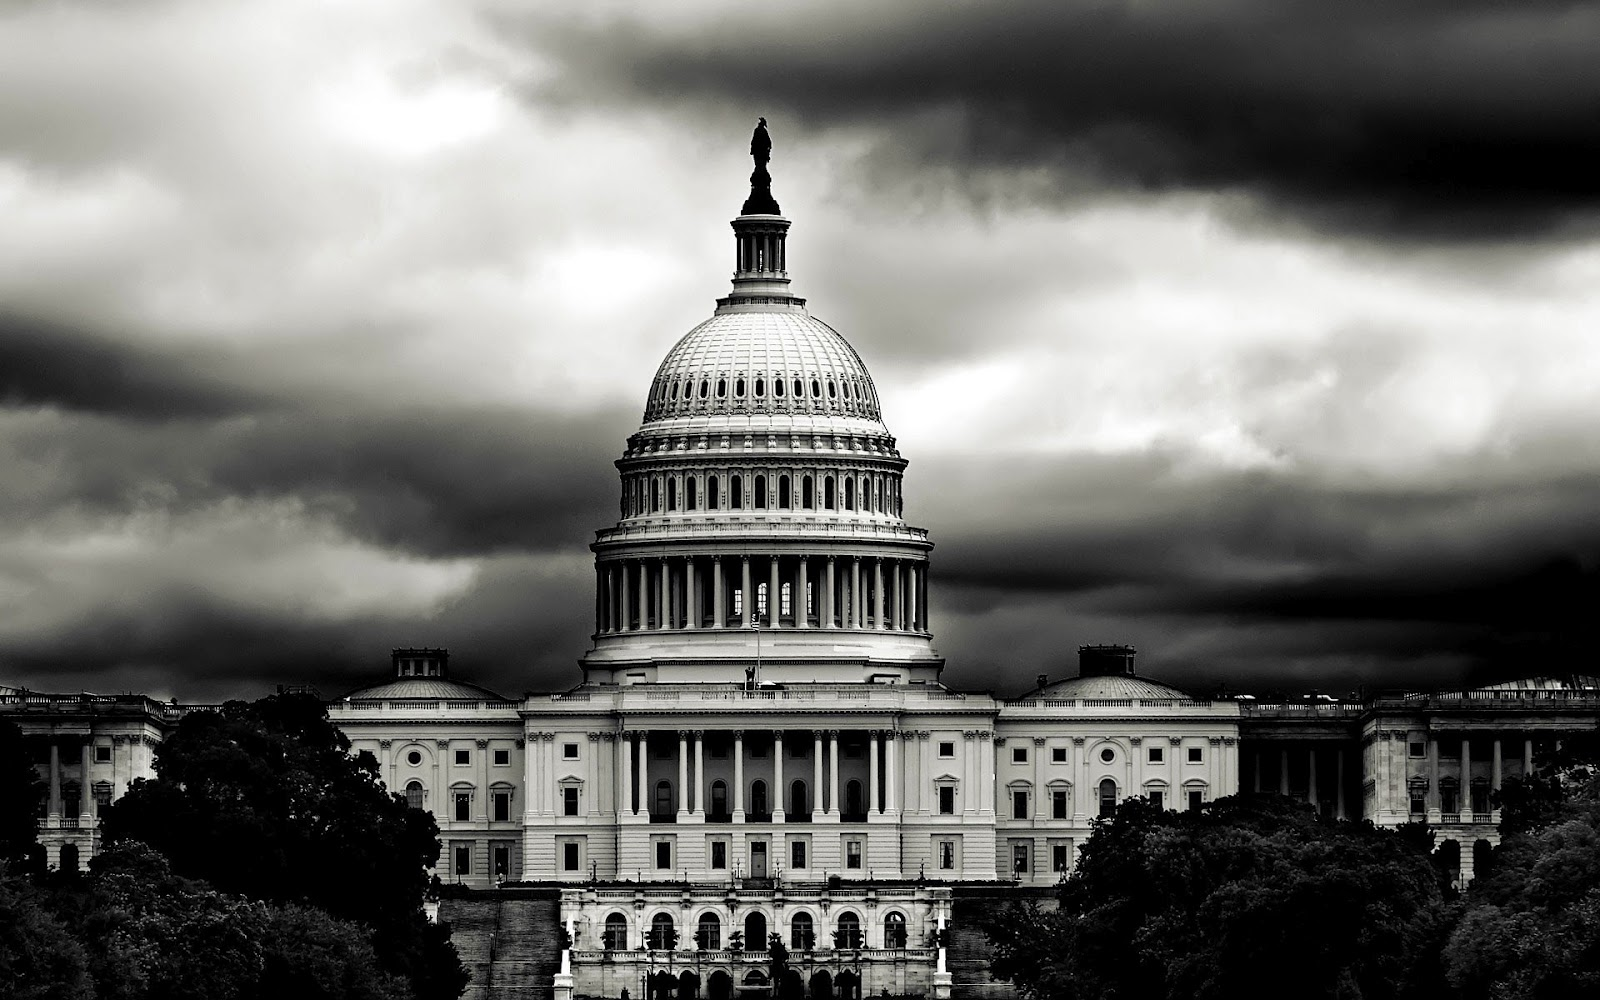 White House America Black Photography Dark Clouds Hd Desktop Wallpaper